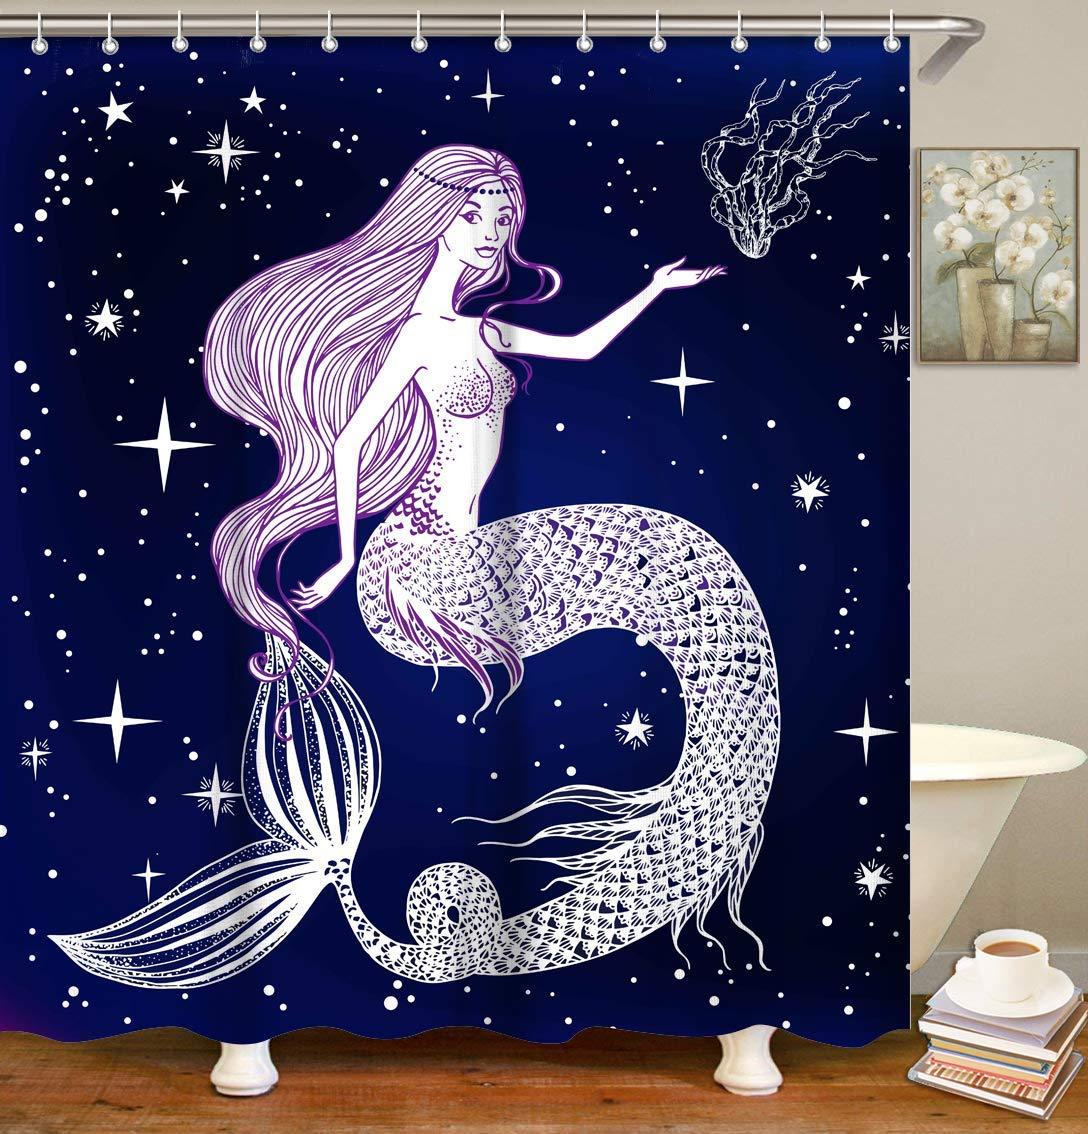 Amazon Com Livilan Mermaid Shower Curtain Set With 12 Hooks